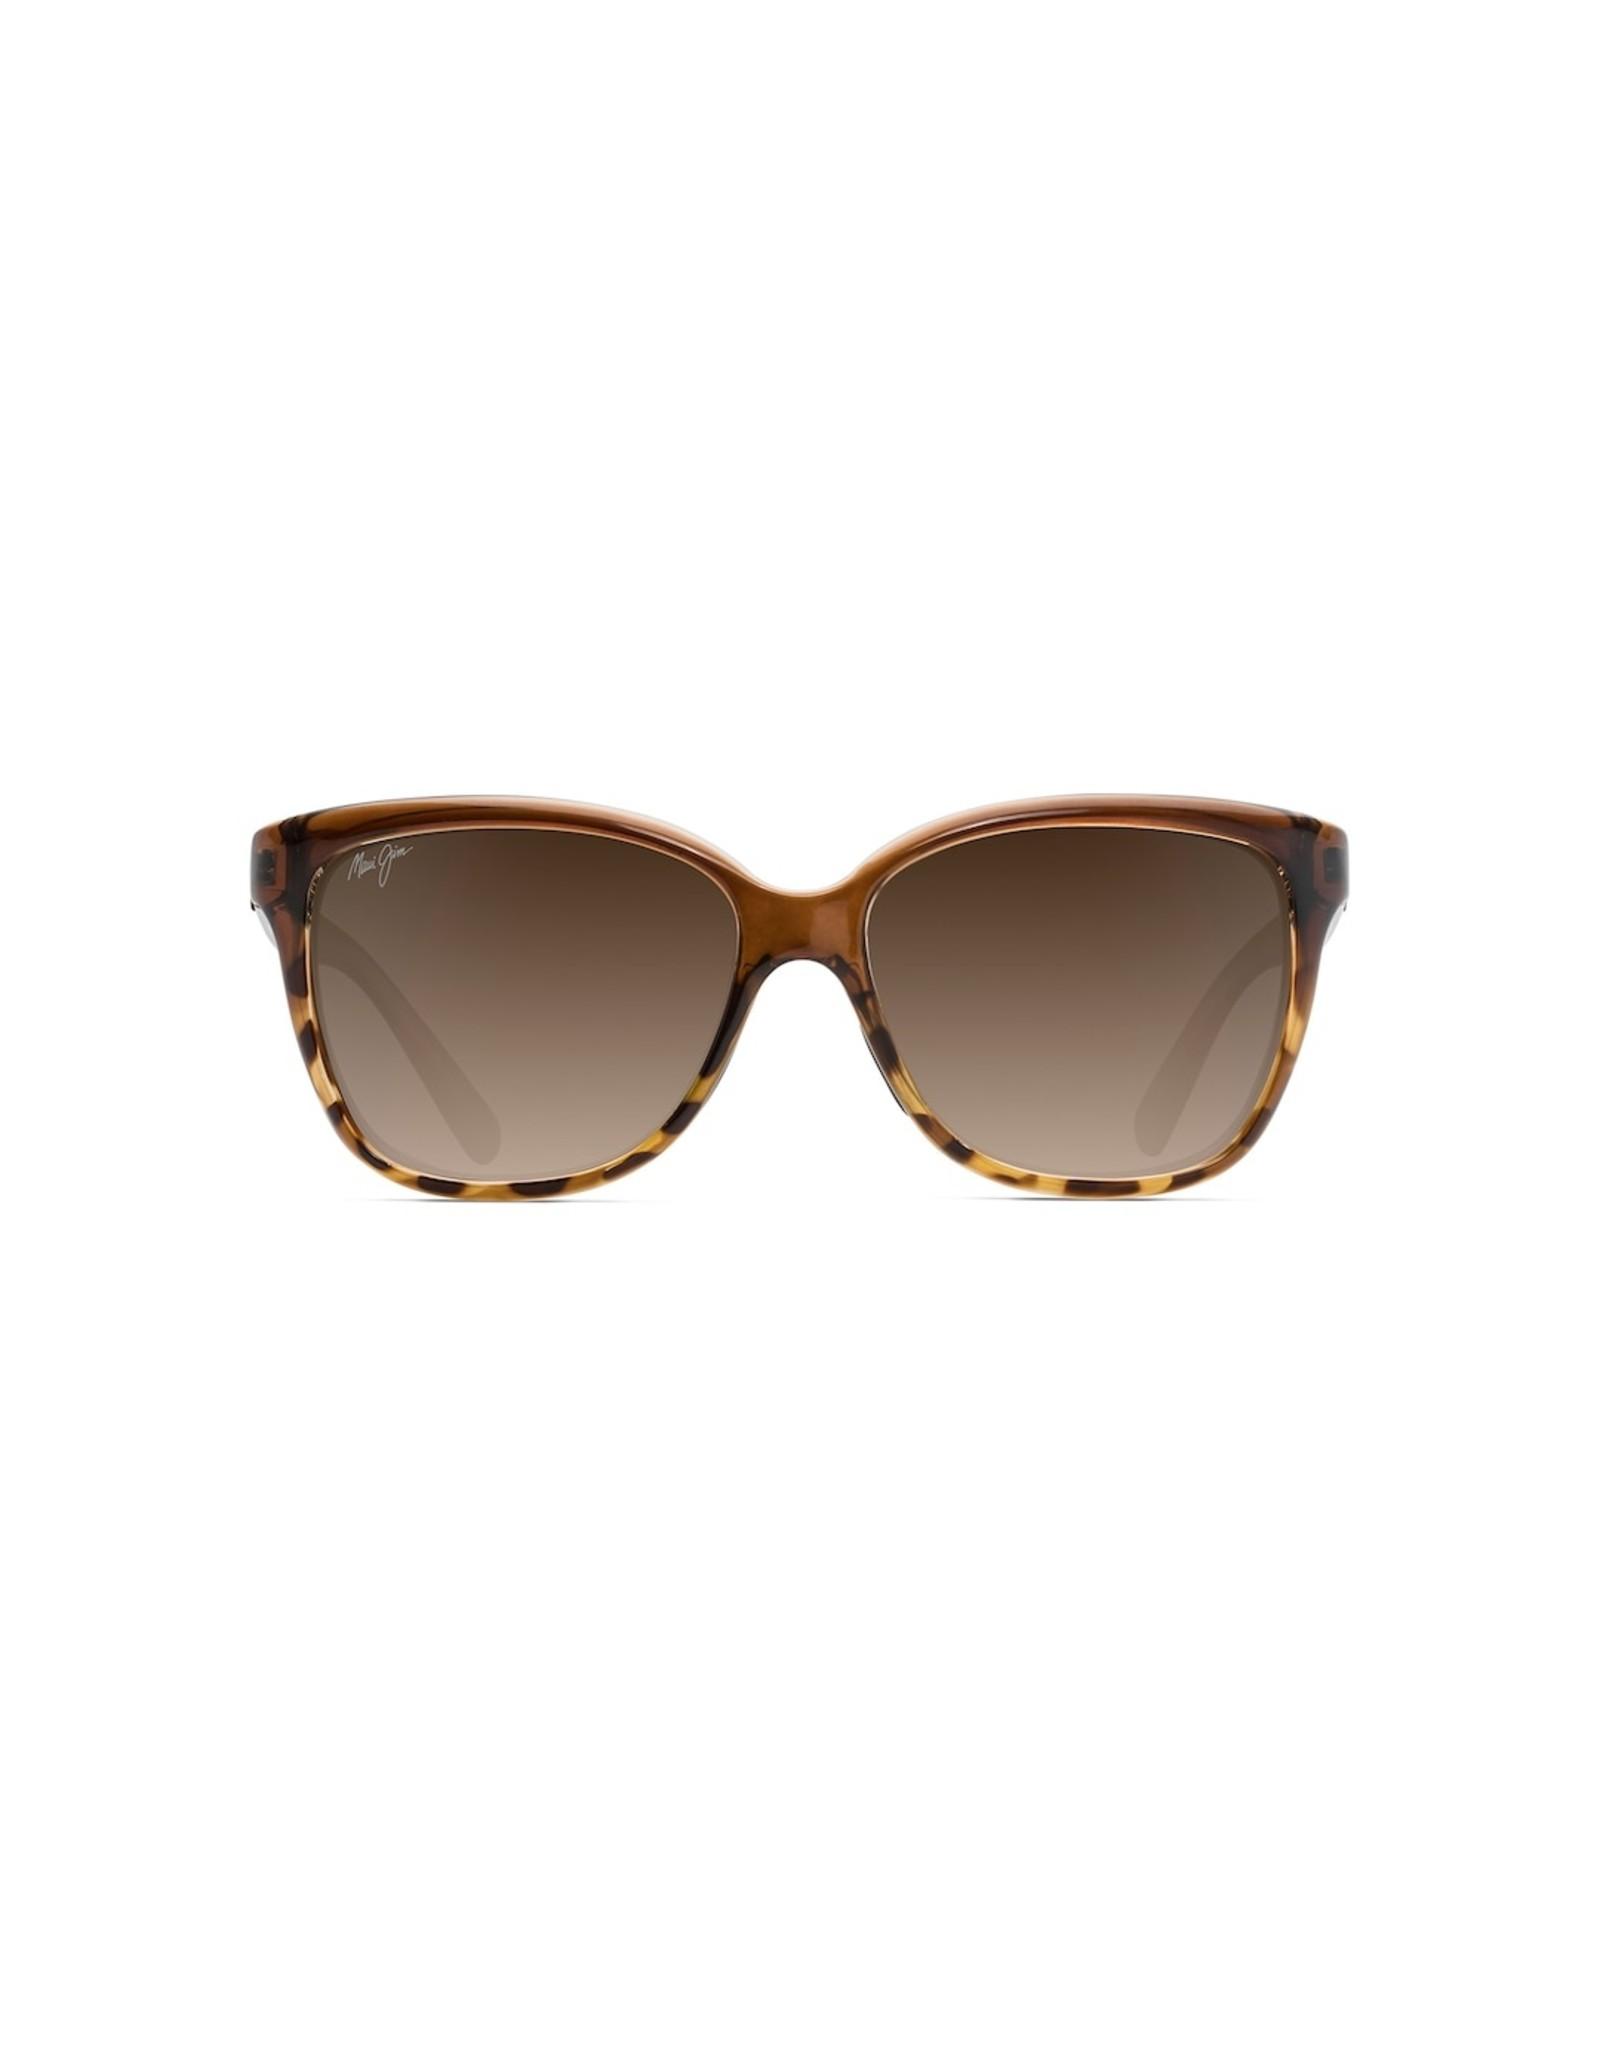 Maui Jim Maui Jim 'Starfish' Sunglasses